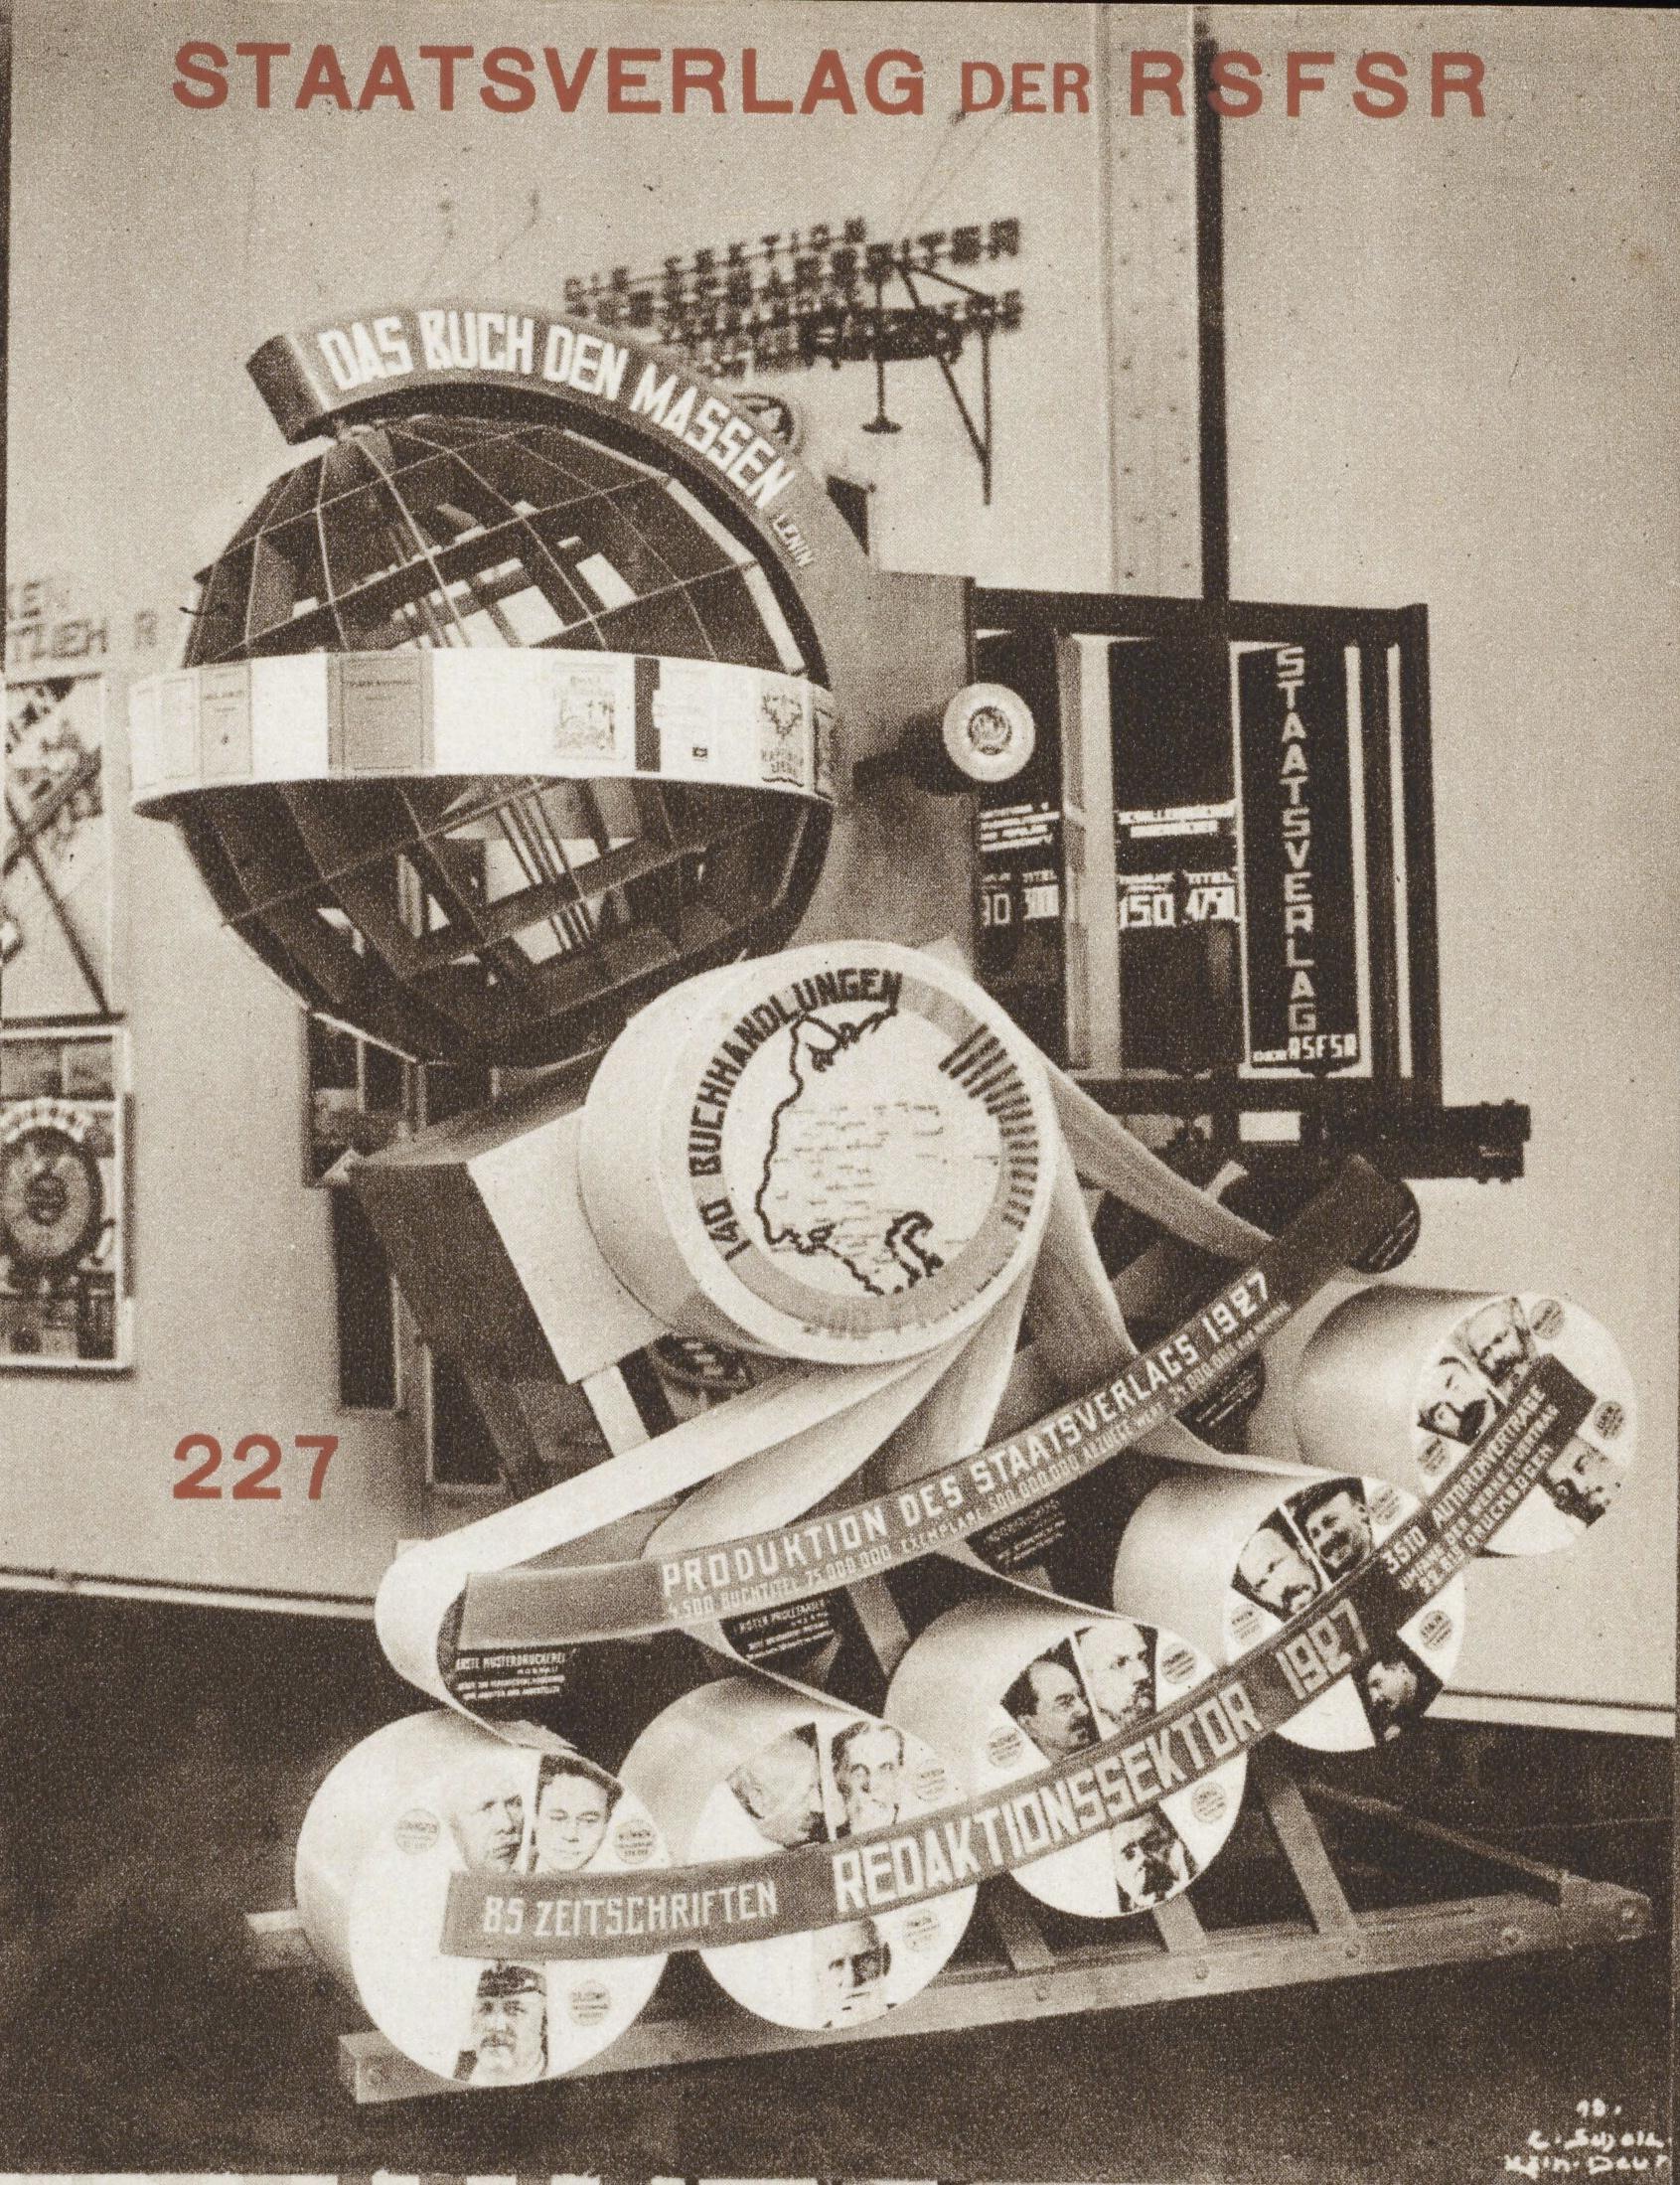 Katalog des Sowjet-Pavillons auf der Internationalen Presse-Ausstellung Köln 1928, pgs 18-20b1